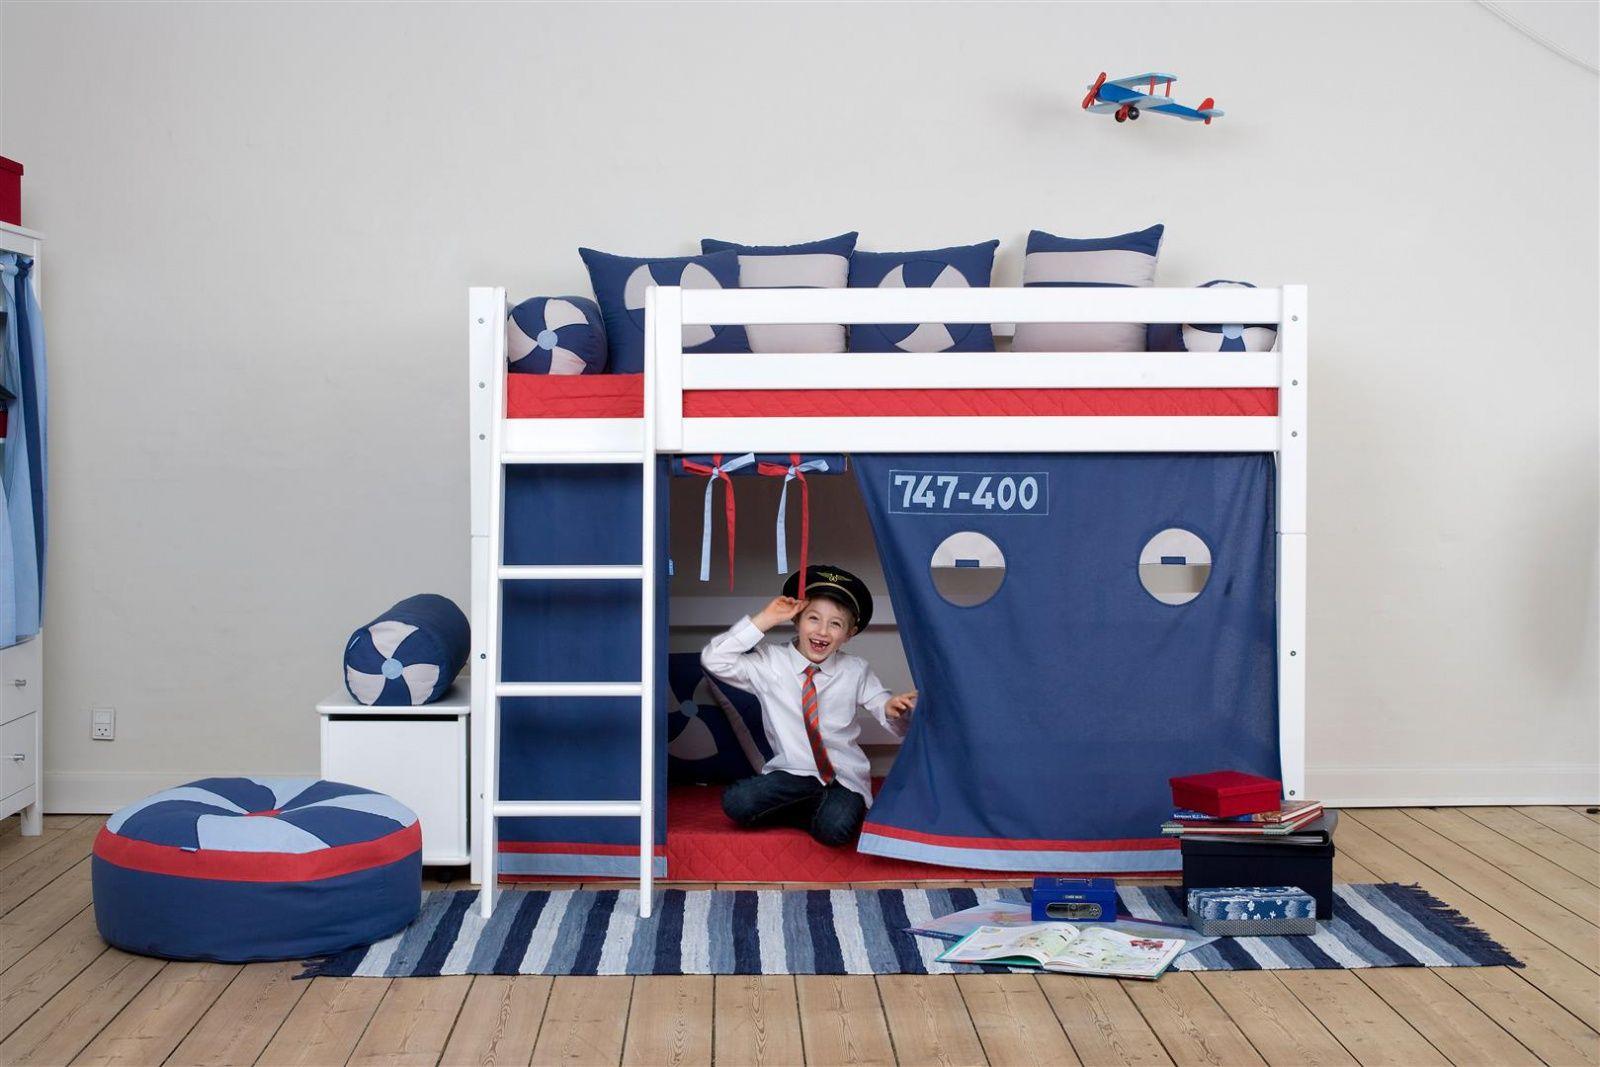 hochbett popeye hochbett kinder etagen und hochbetten pinterest hochbett kinder. Black Bedroom Furniture Sets. Home Design Ideas